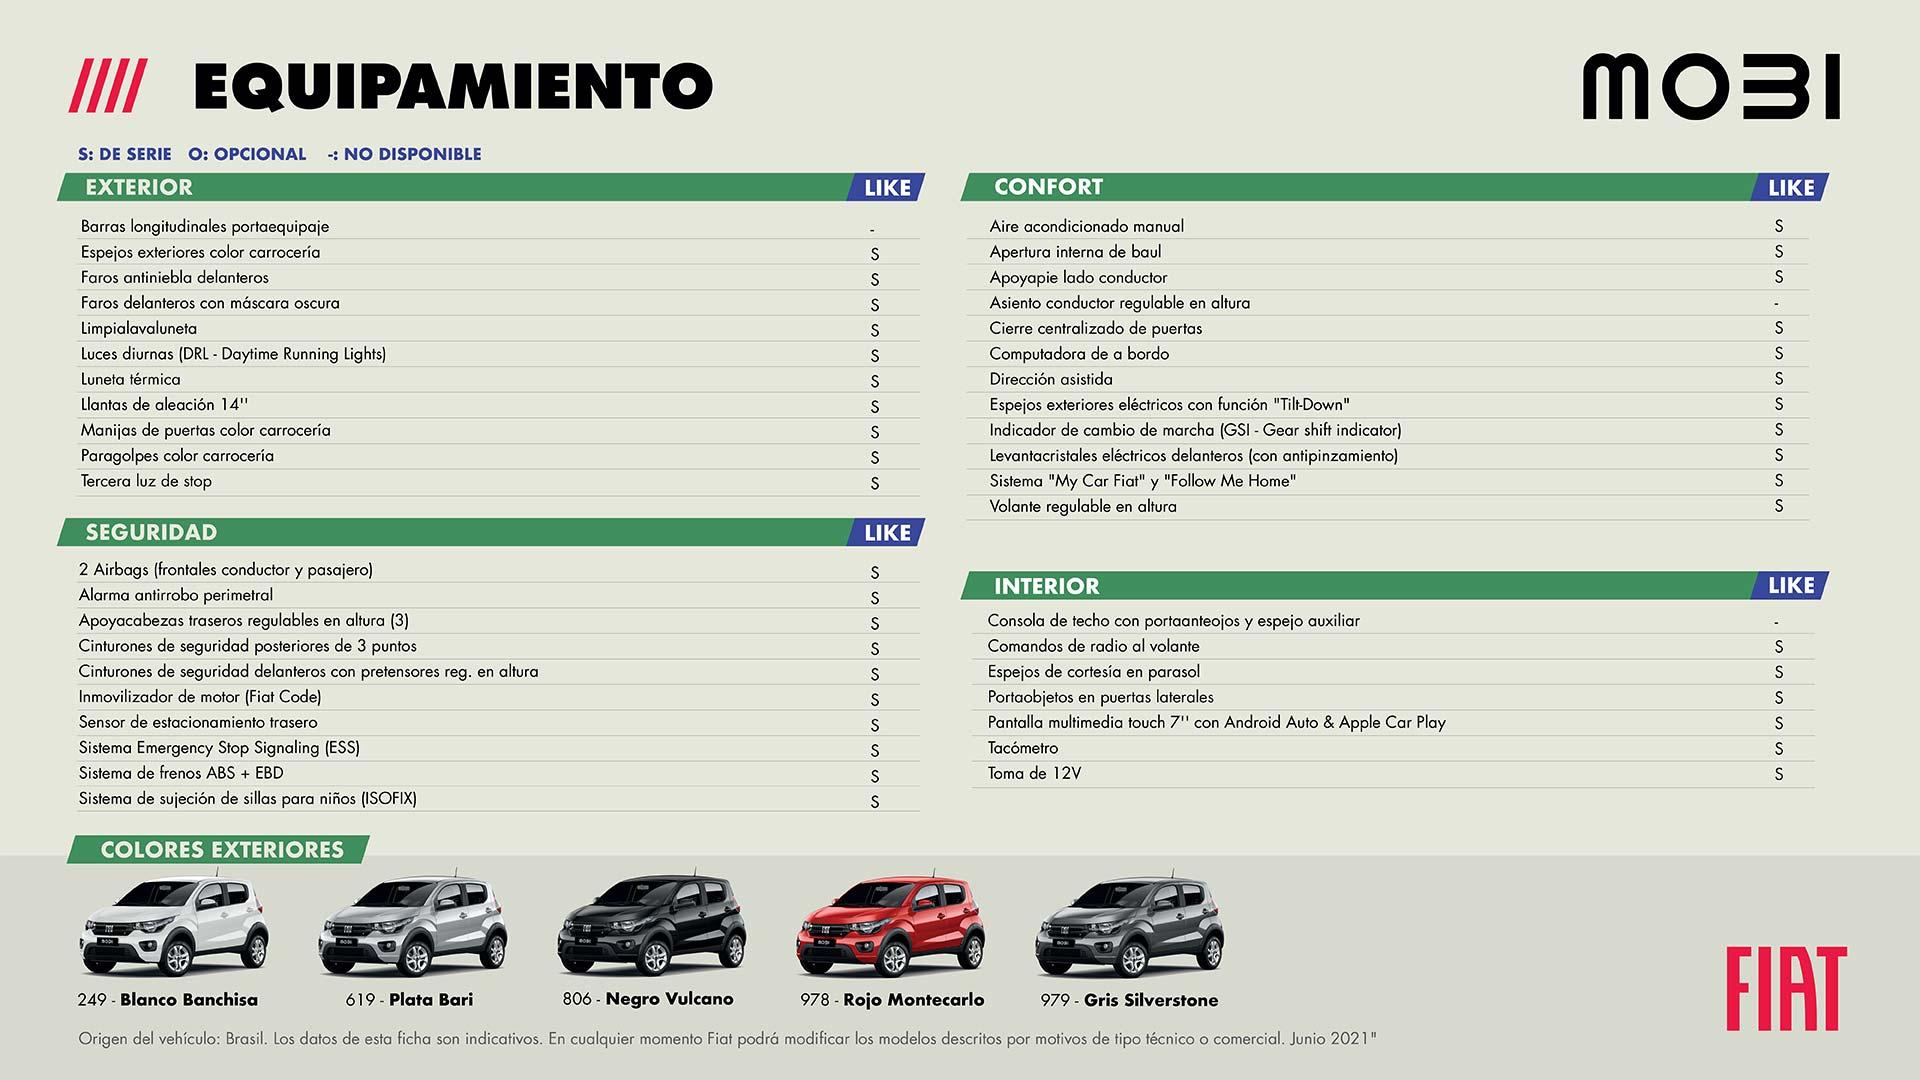 Equipamiento Fiat Mobi 2021